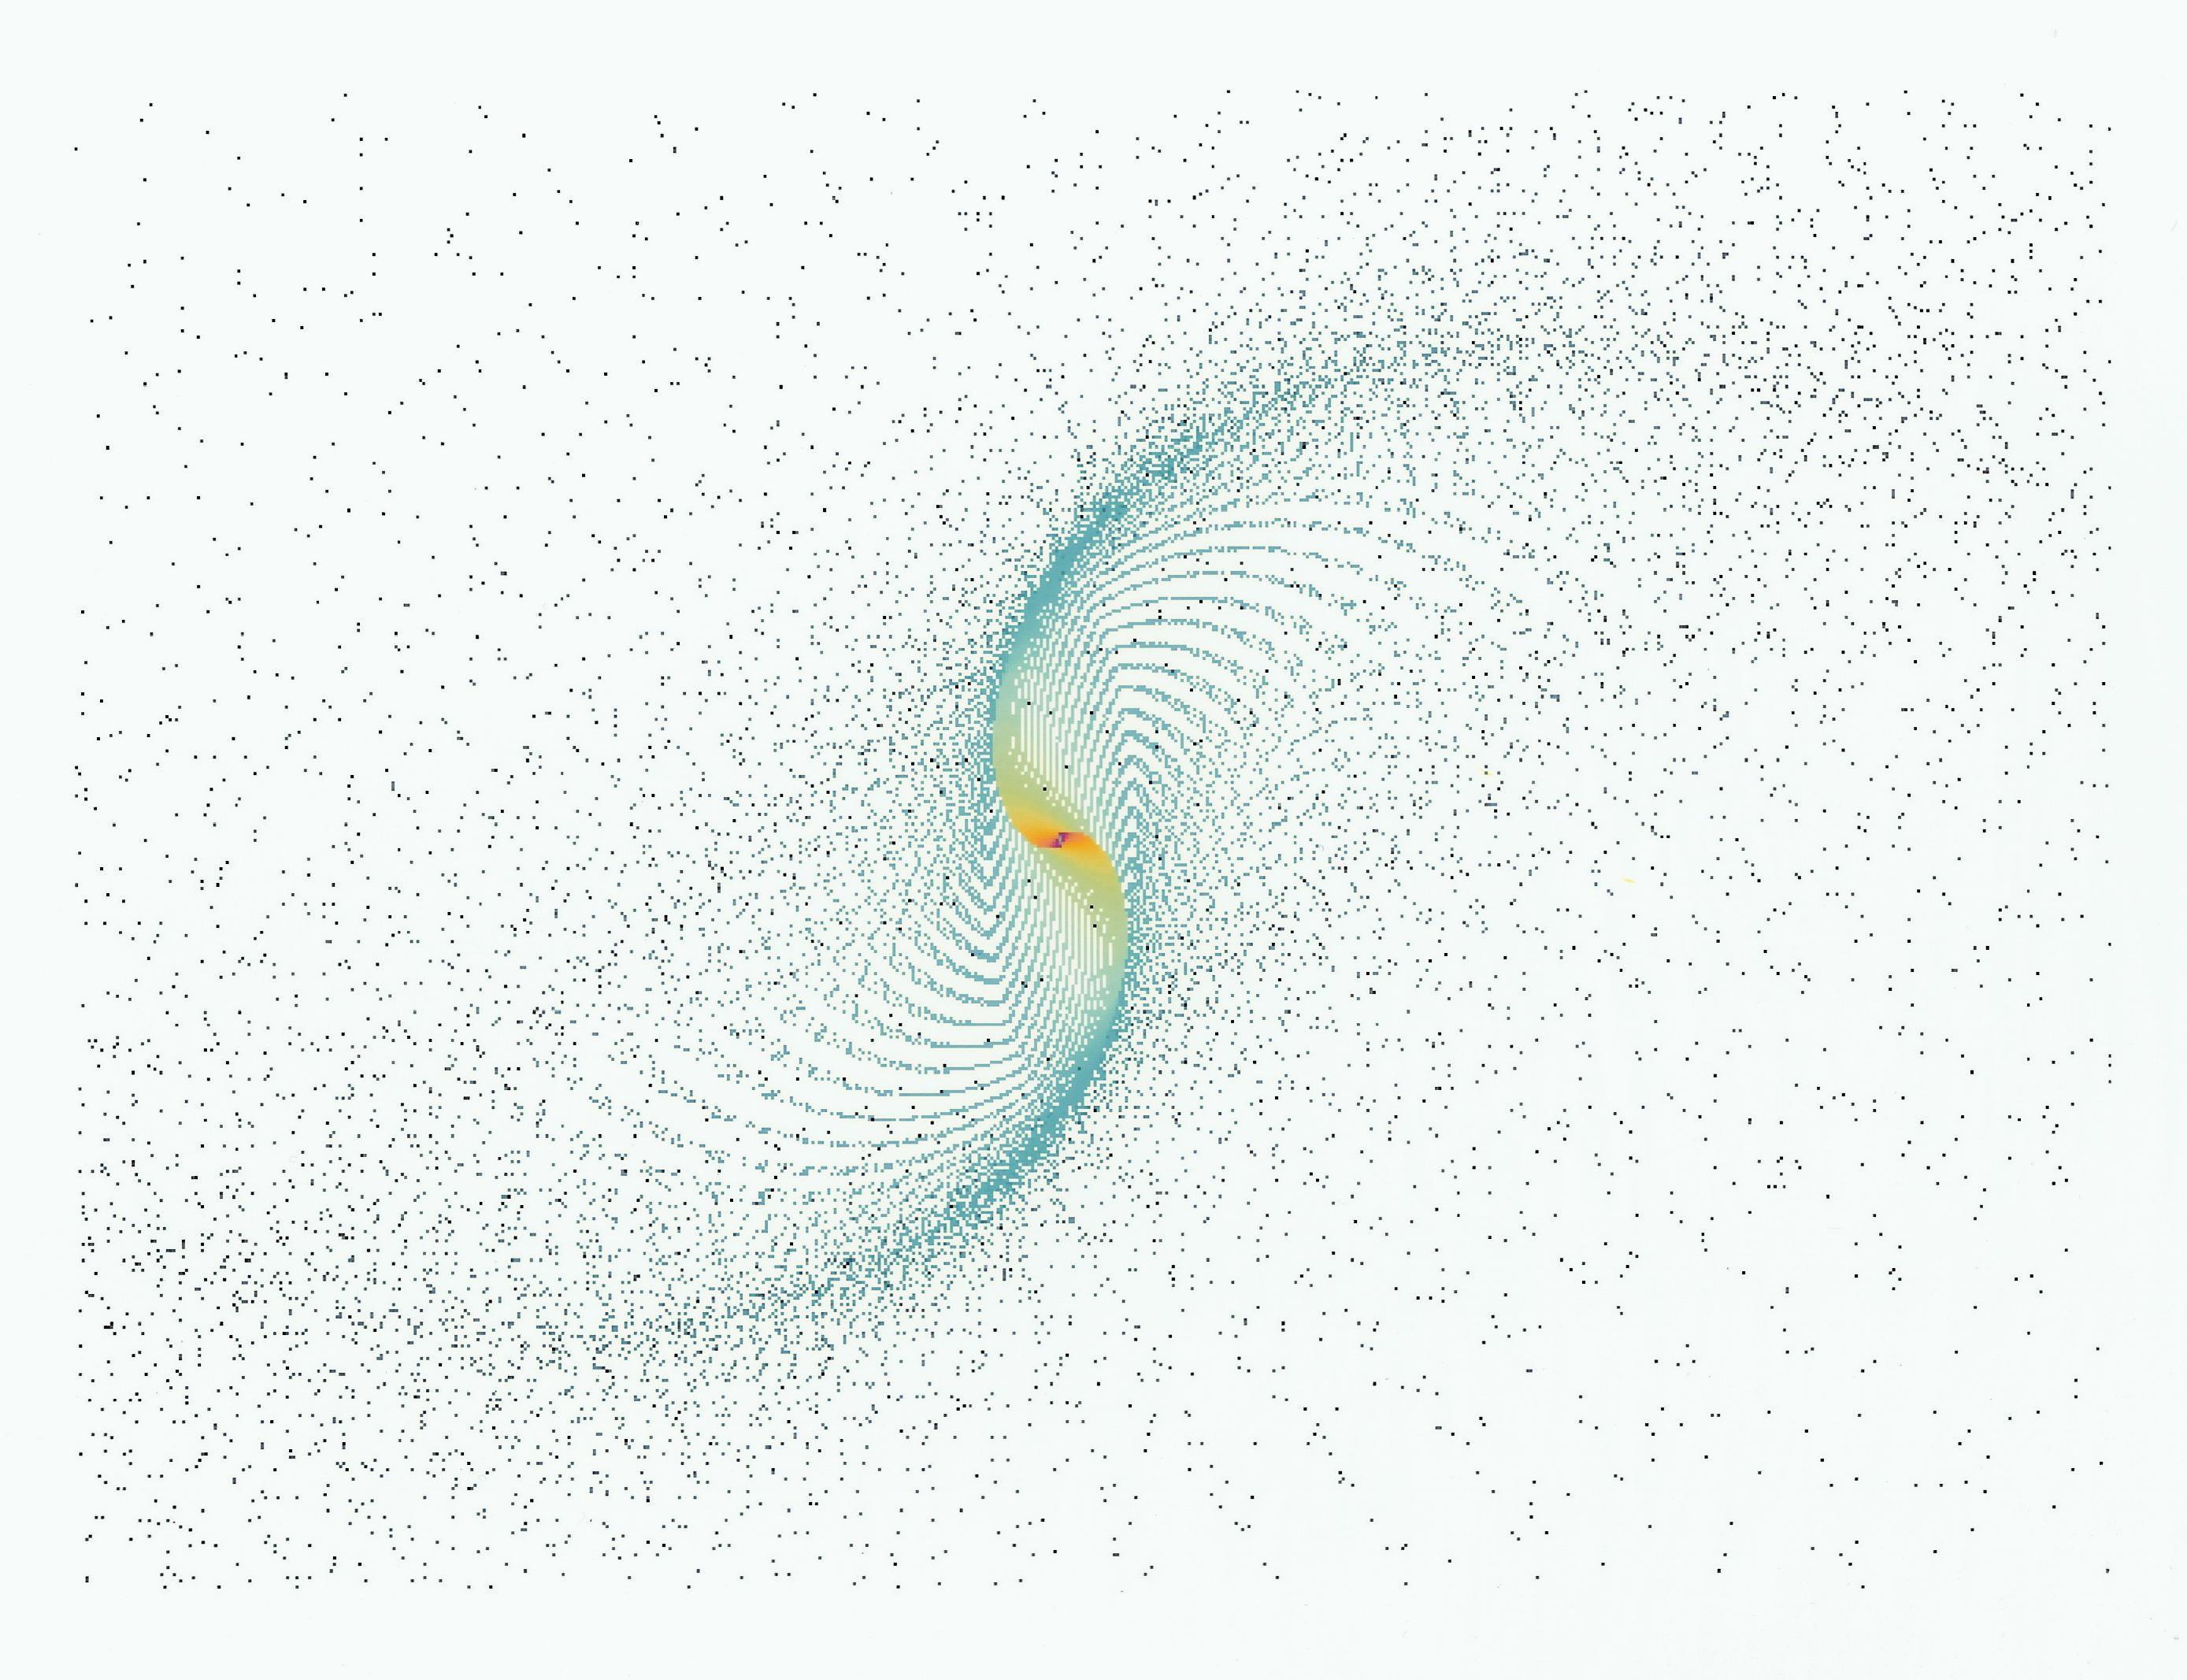 Spyrografx Harmonograph Simulator - Bild: Chaos Ordnung